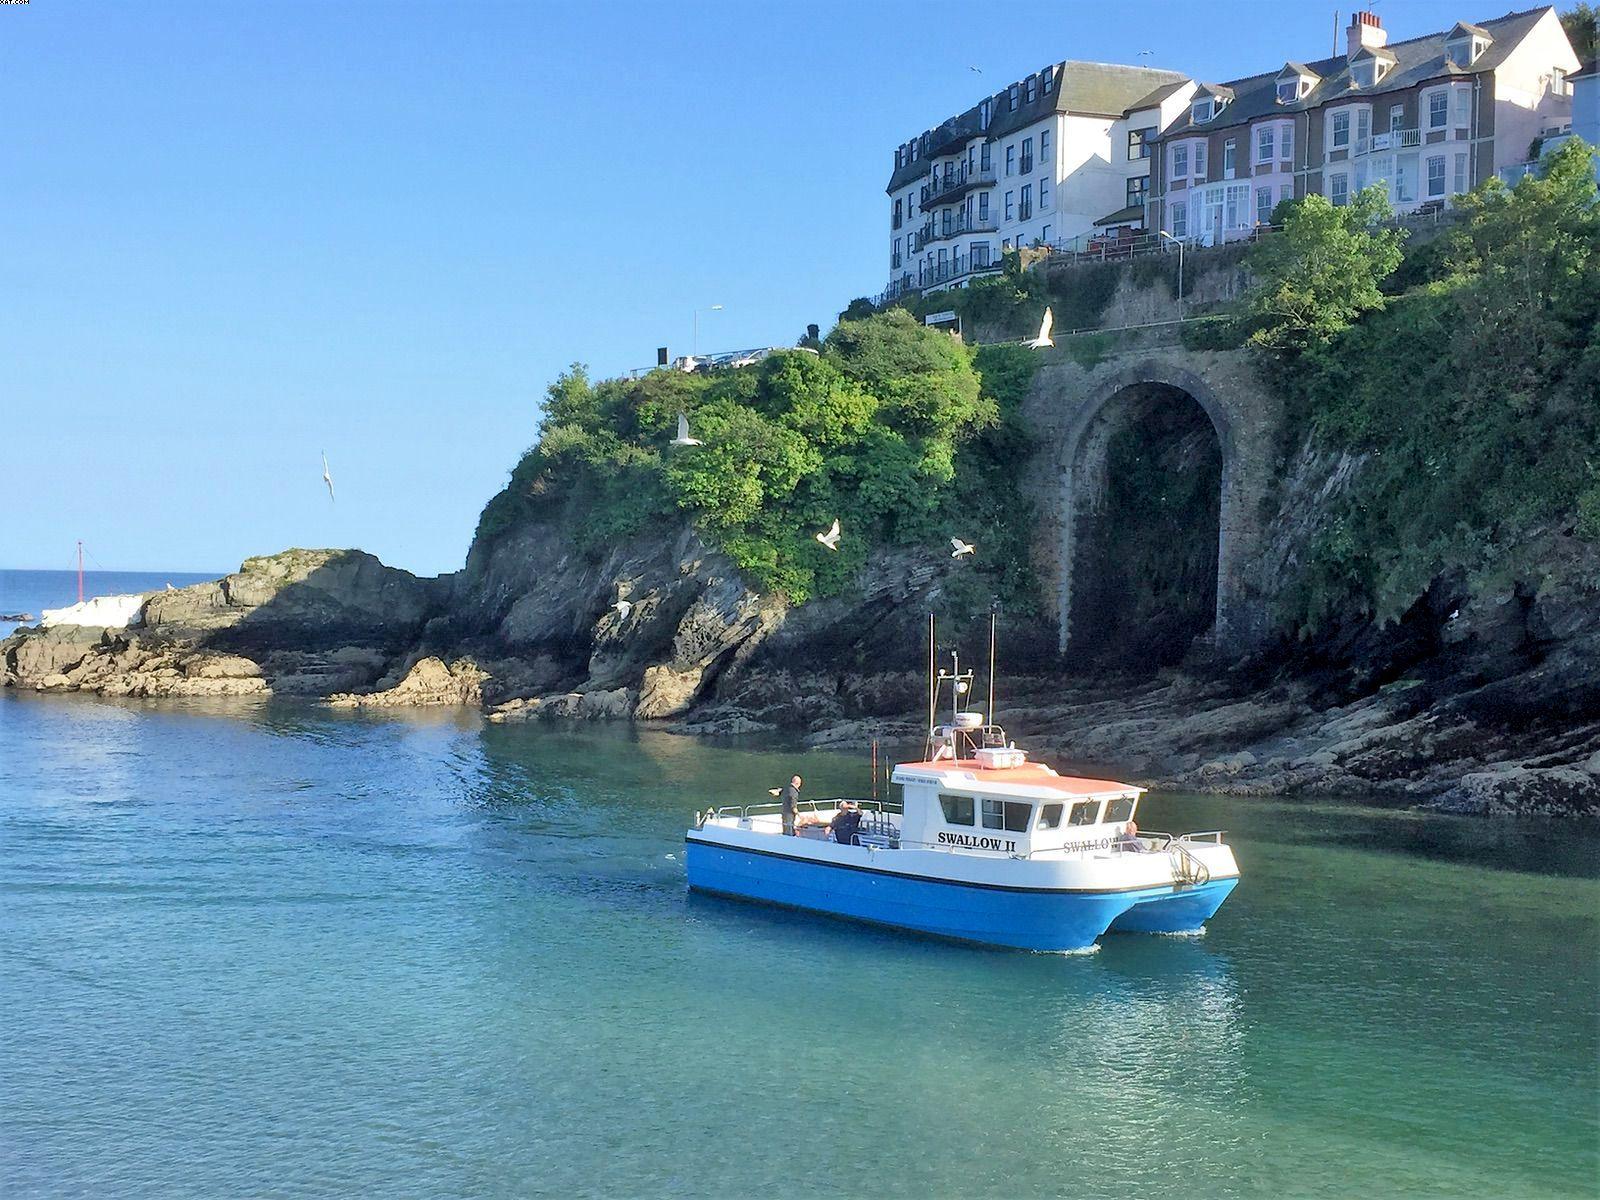 Swallow fishing boat returning to Looe River Cornwall